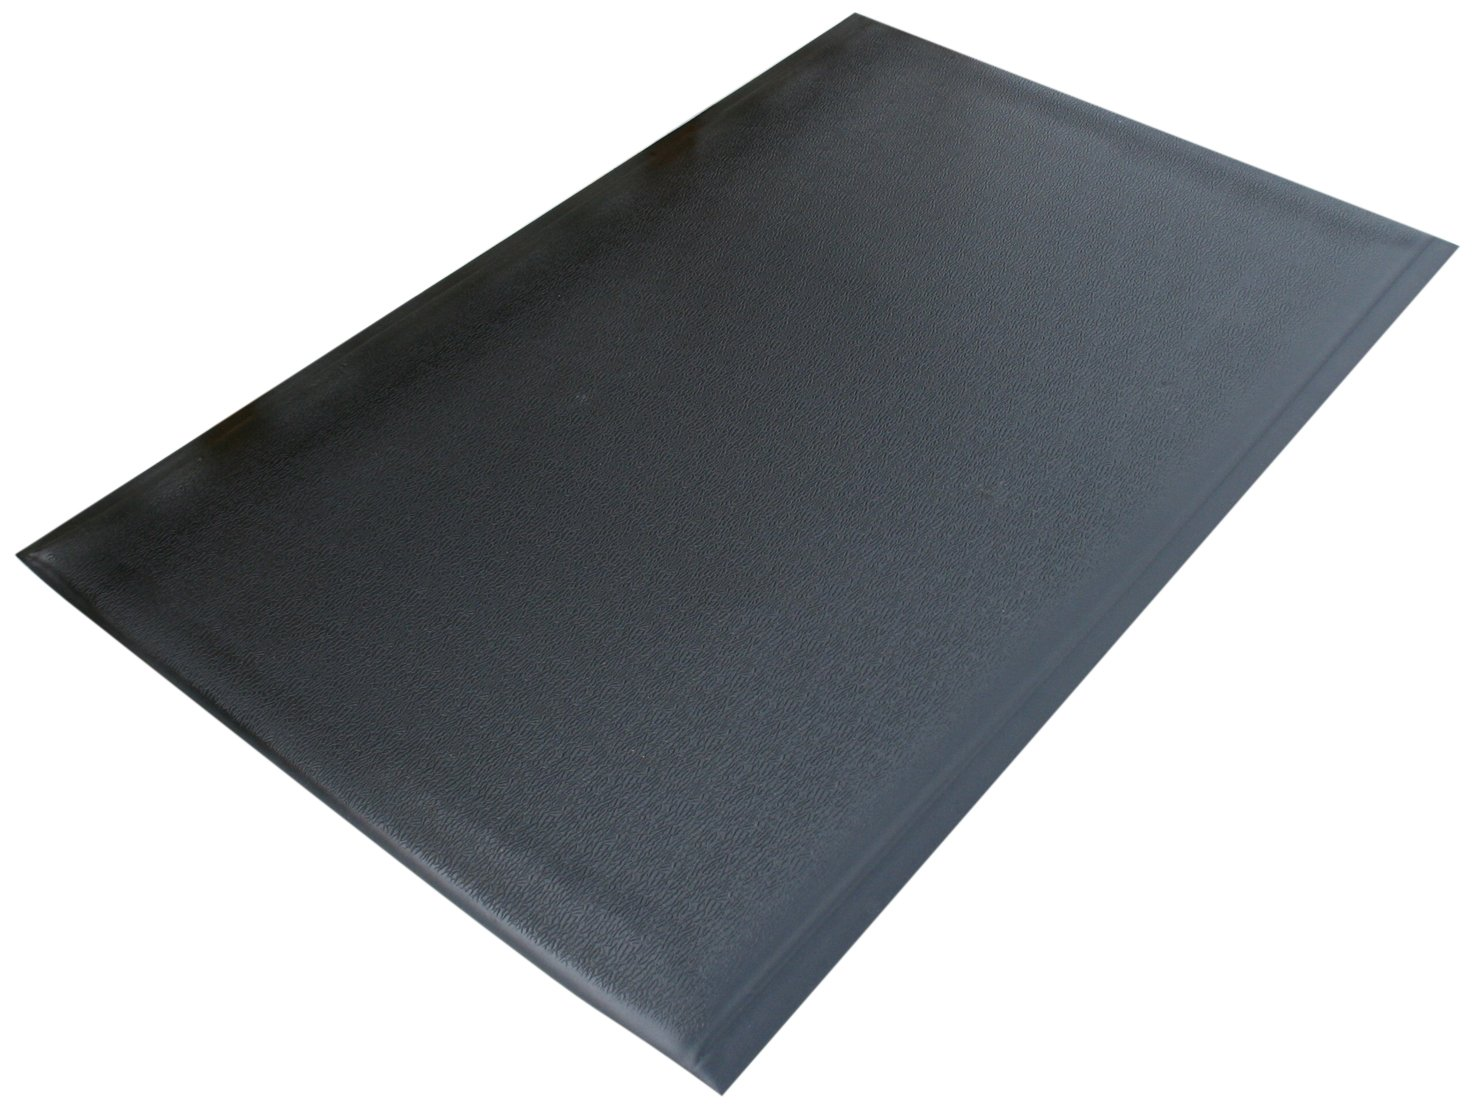 Rhino Mats DS-4872 Dura Step Anti-Fatigue Mat, 4' Width x 6' Length x 1/2'' Thickness, Black